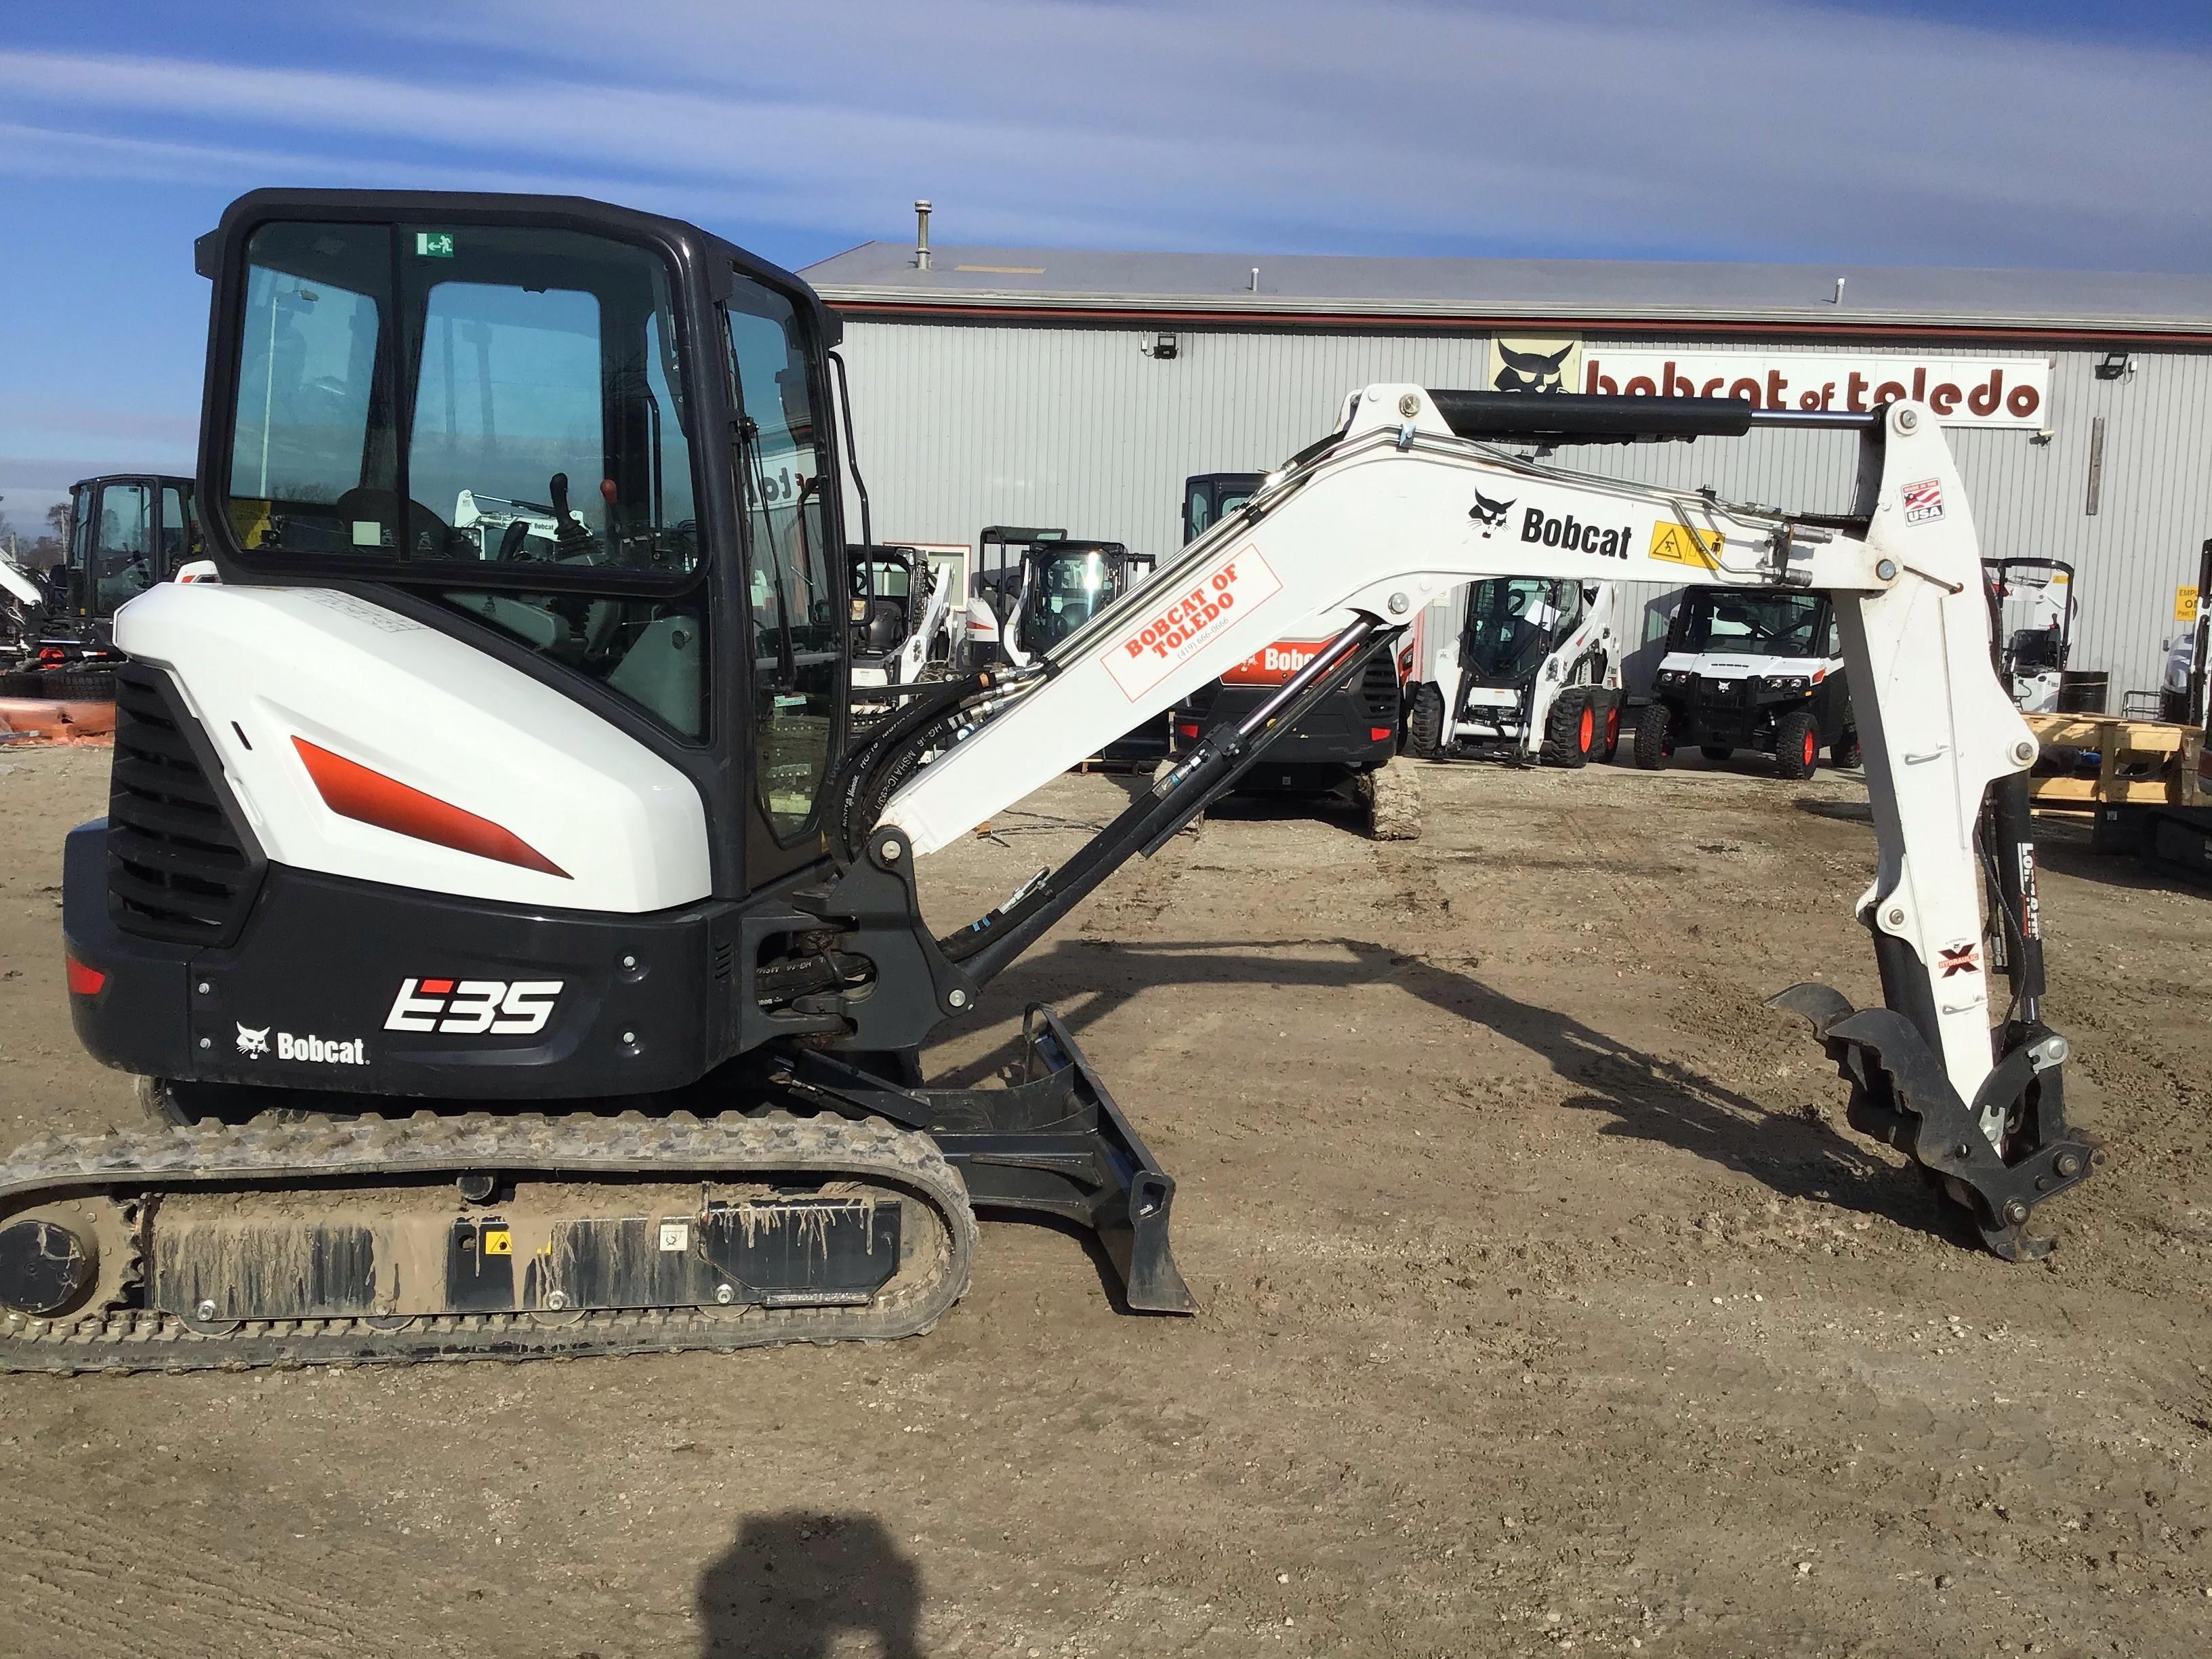 Used, 2020, Bobcat, E35i T4 Long Arm, Excavators